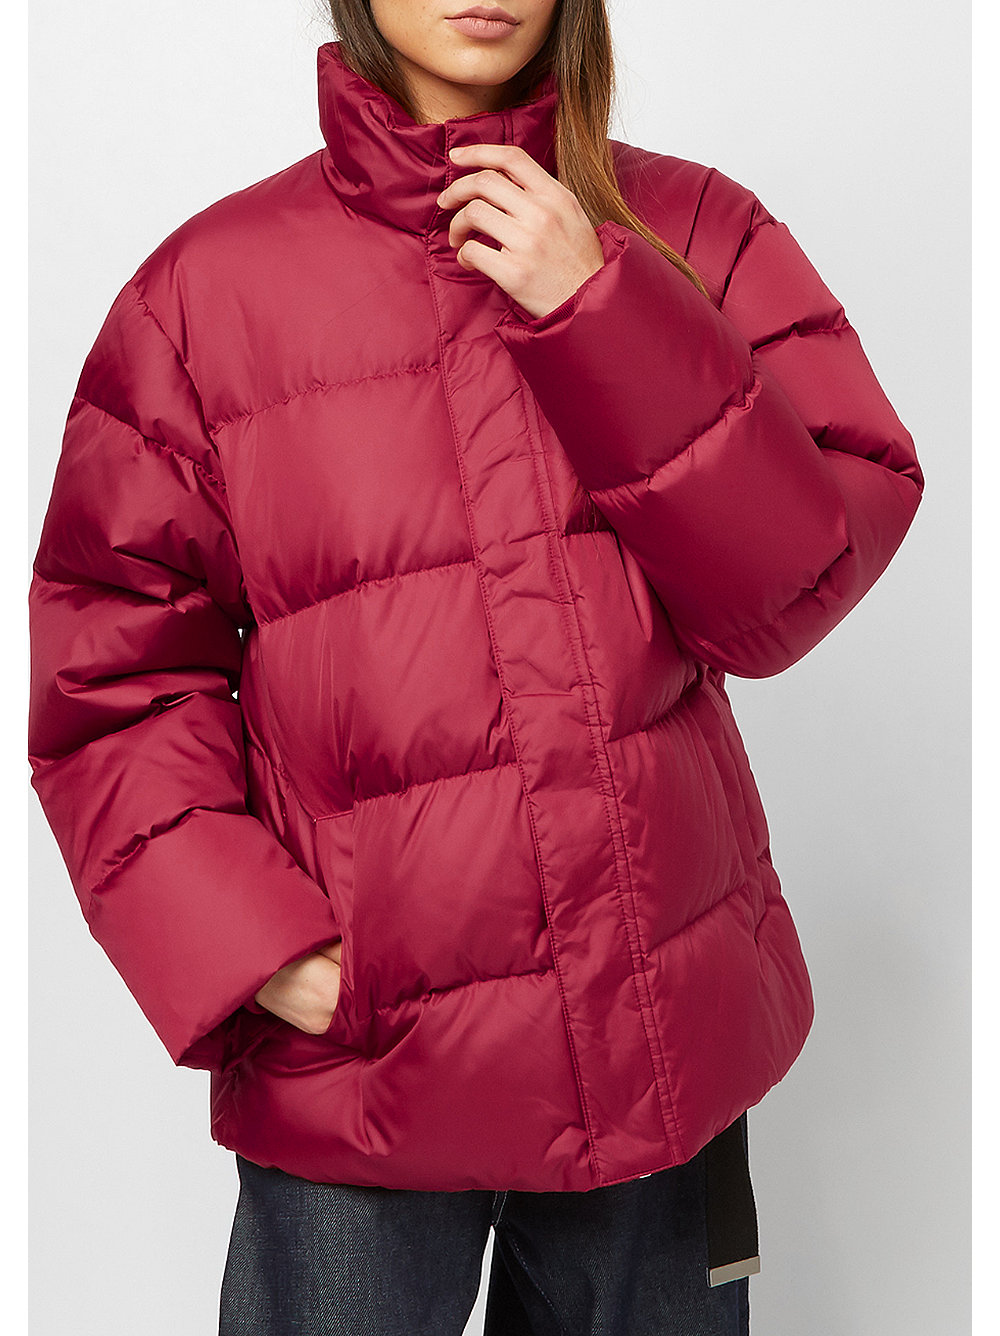 Ordina Carhartt Jacket alla Deming blast WIP SNIPES red rrnFvO8